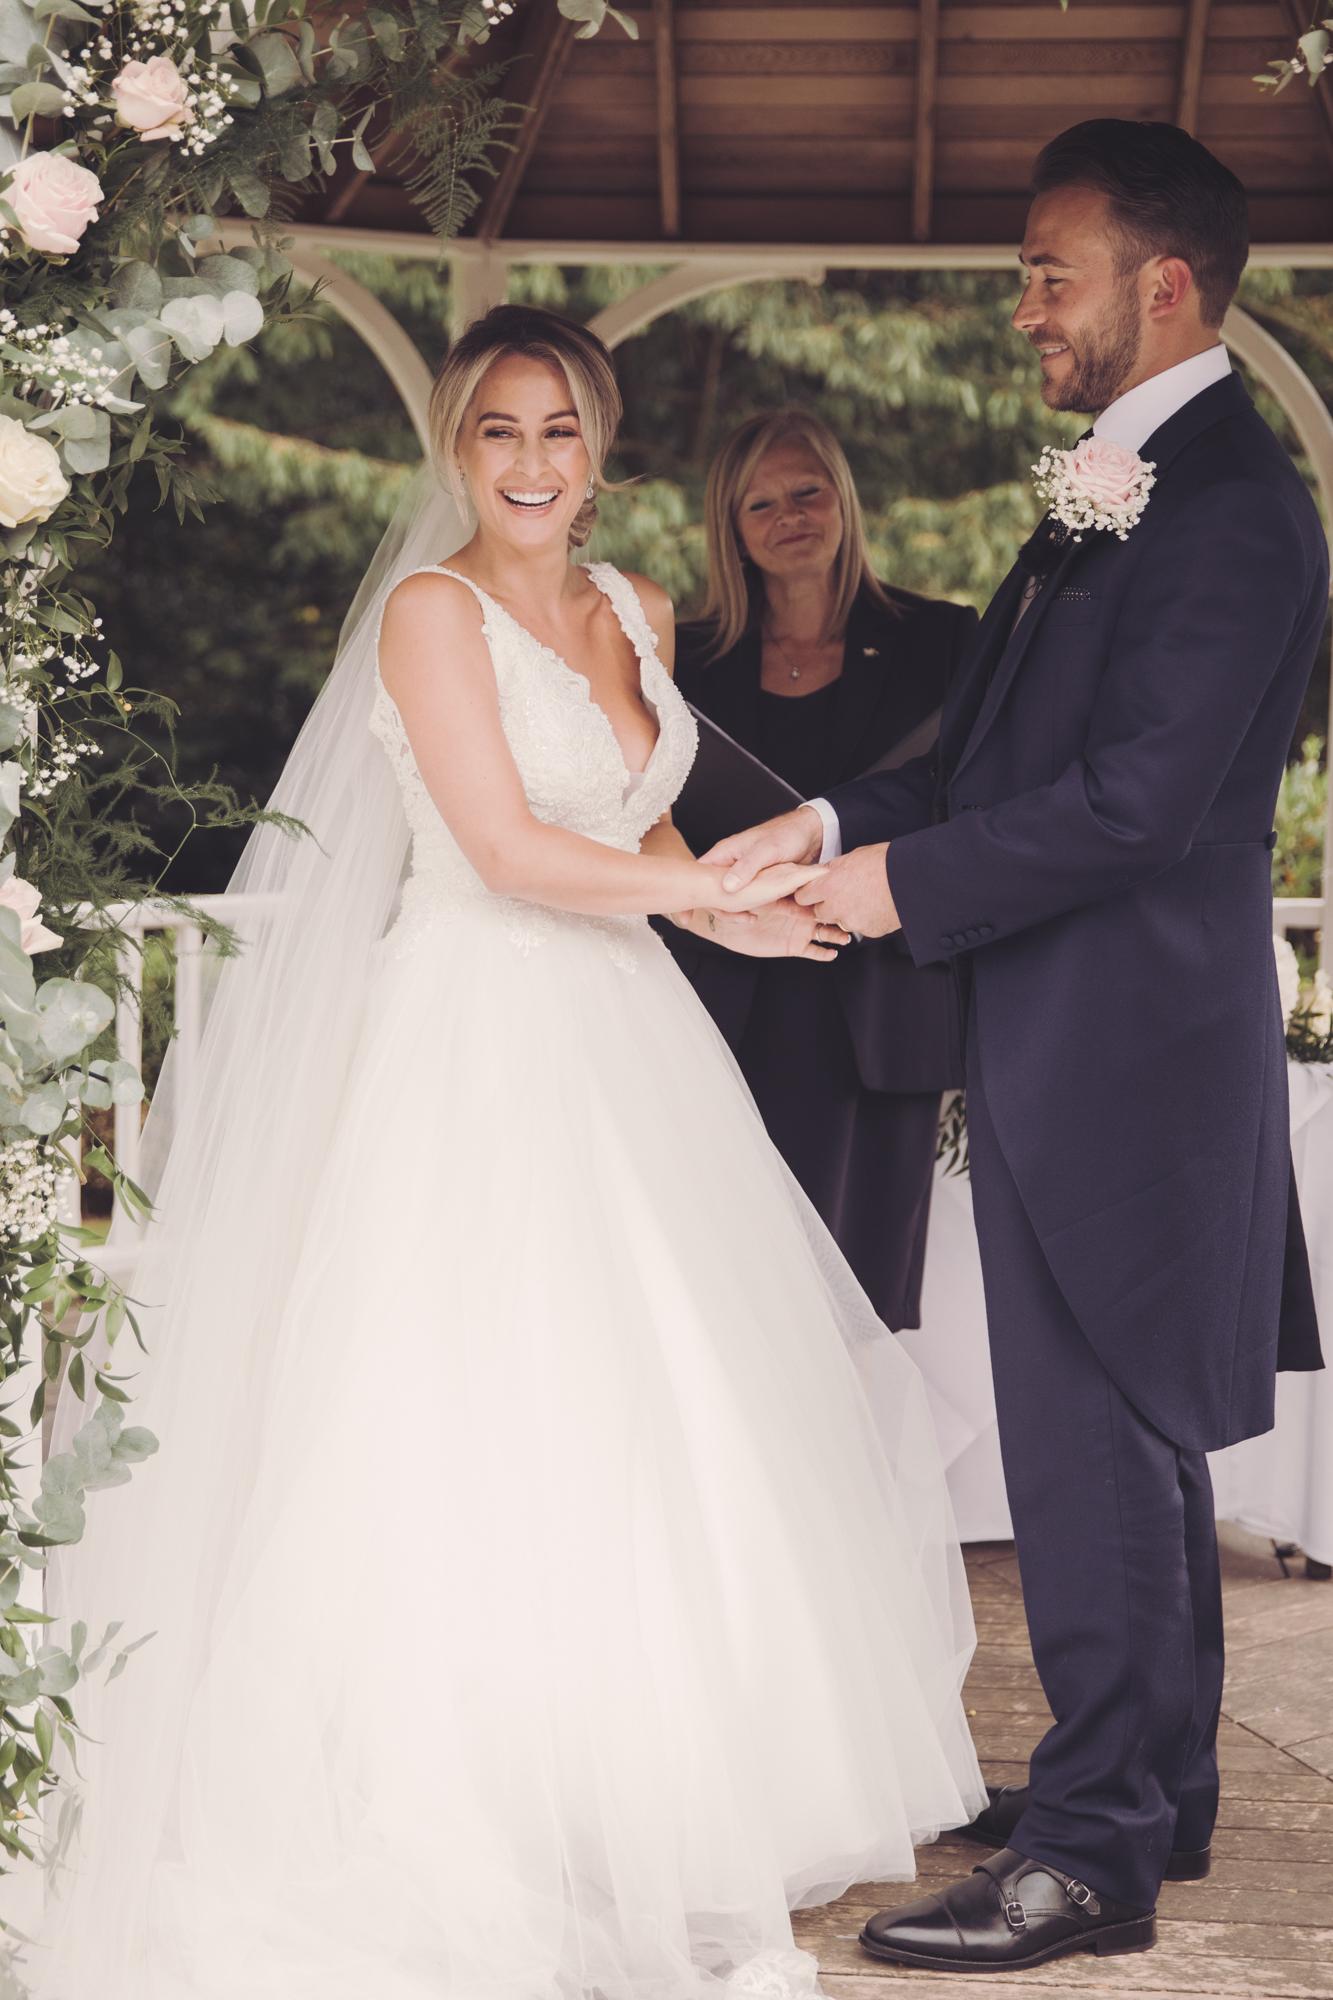 rowhill grange wedding ceremony kent photographer